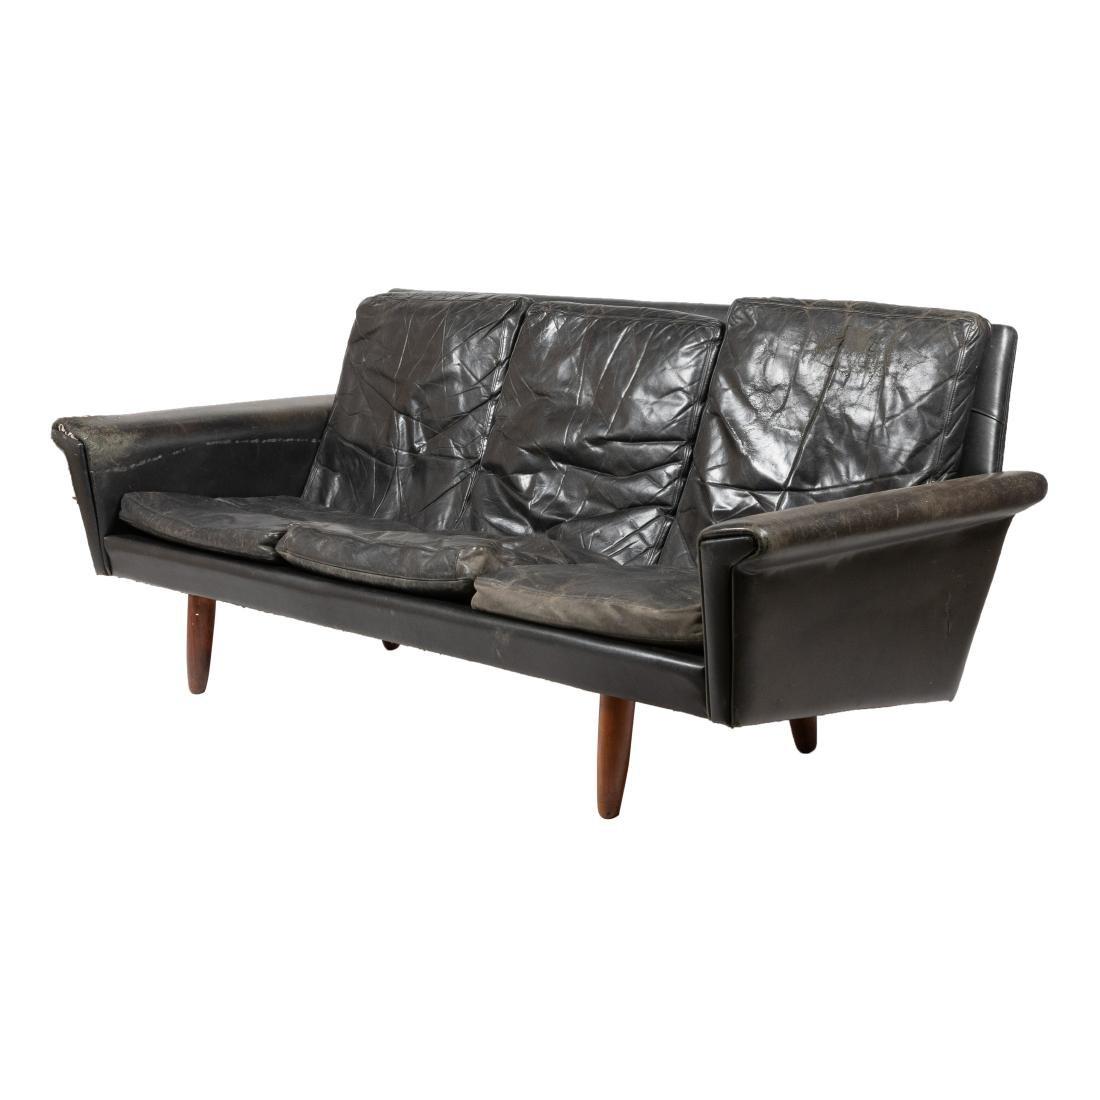 Danish Rosewood and Leather Sofa